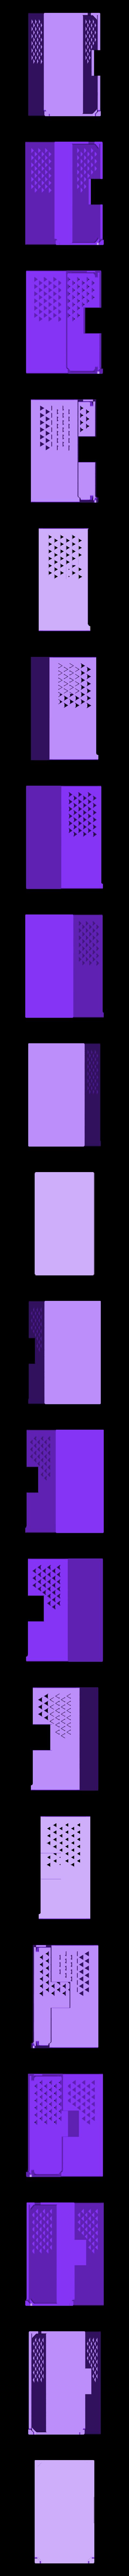 Ramps_1.4_Box_Bottom.stl Download free STL file Zero Hardware RAMPS 1.4 Box • Design to 3D print, bobodurand4589